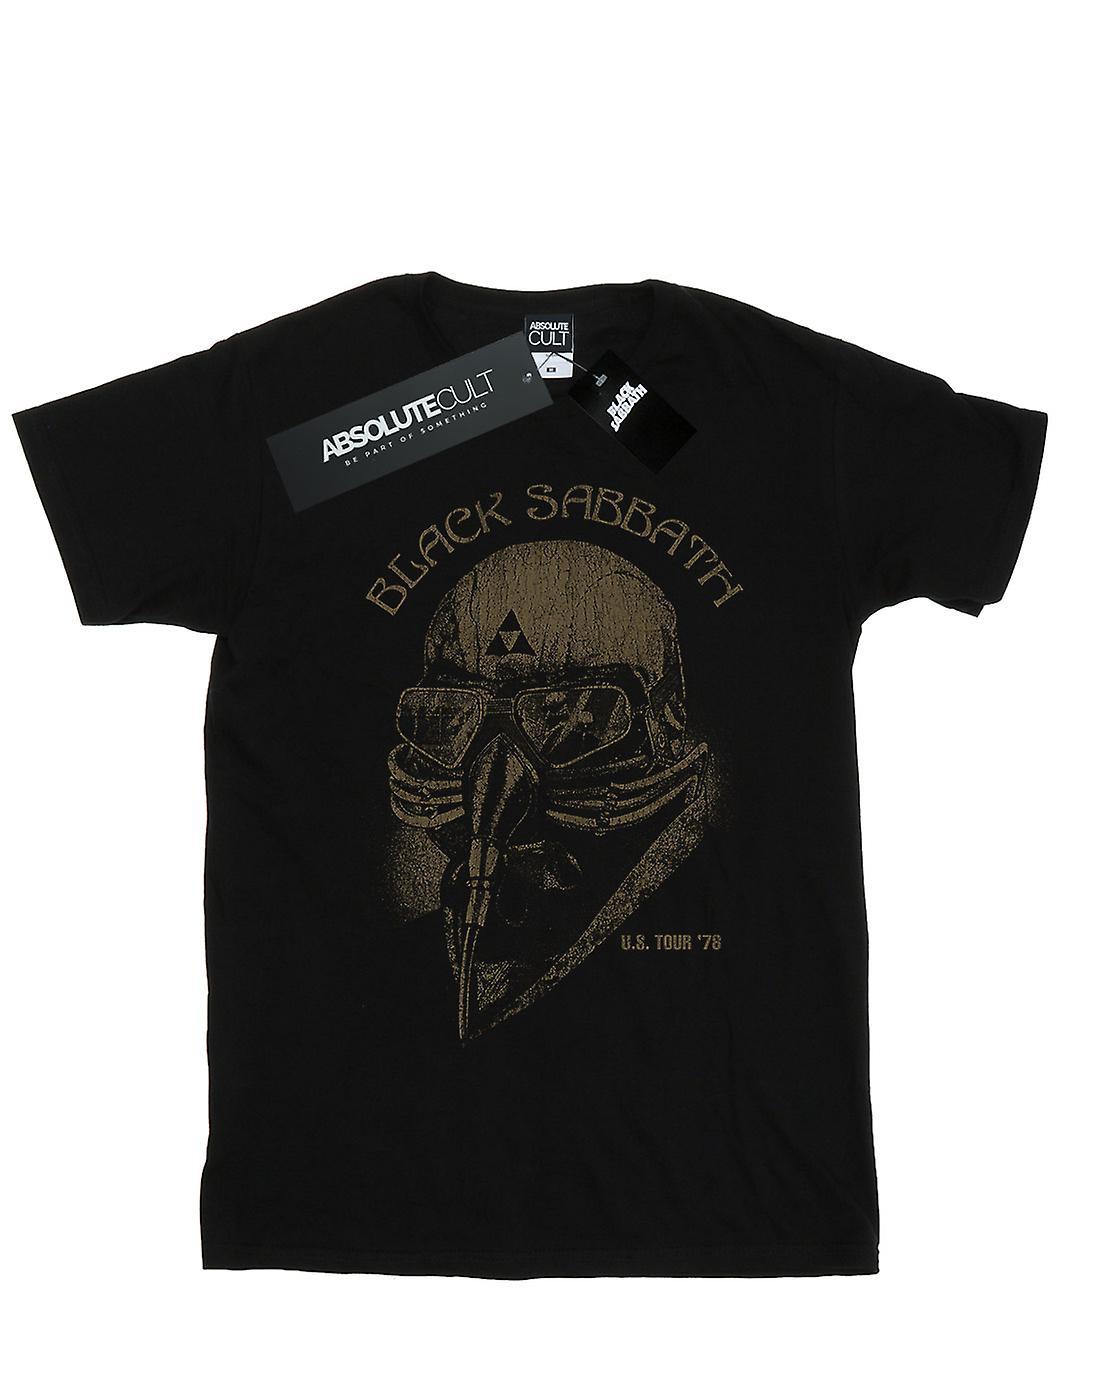 Black Sabbath Women's Tour 78 Boyfriend Fit T-Shirt